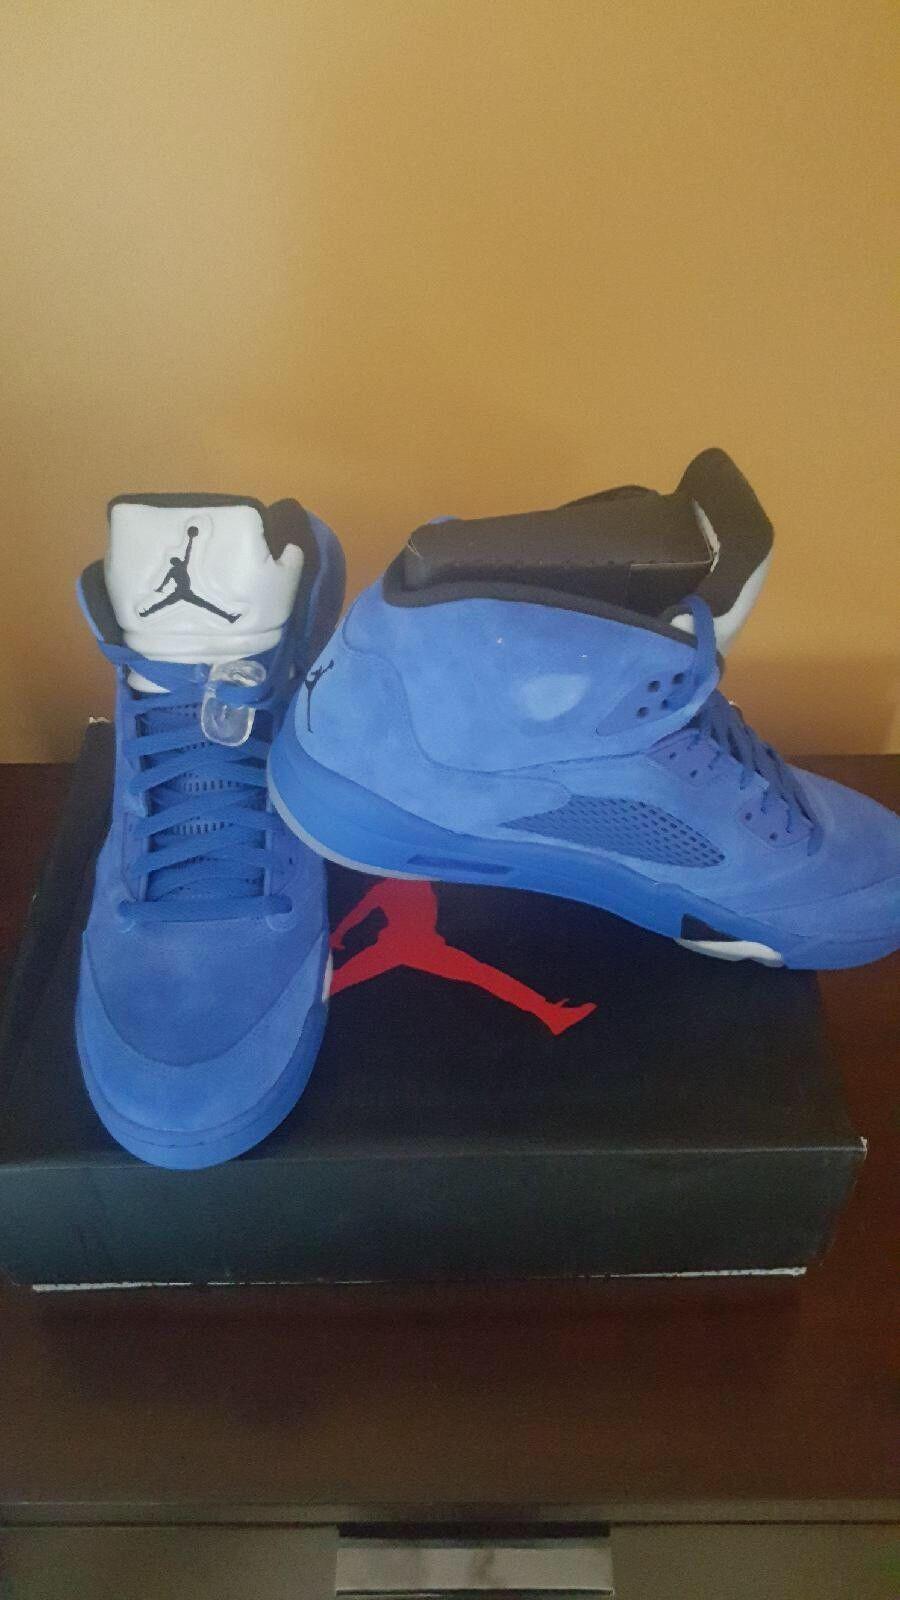 Nike Air Jordan Retro 5 bluee Suede Game Royal Black